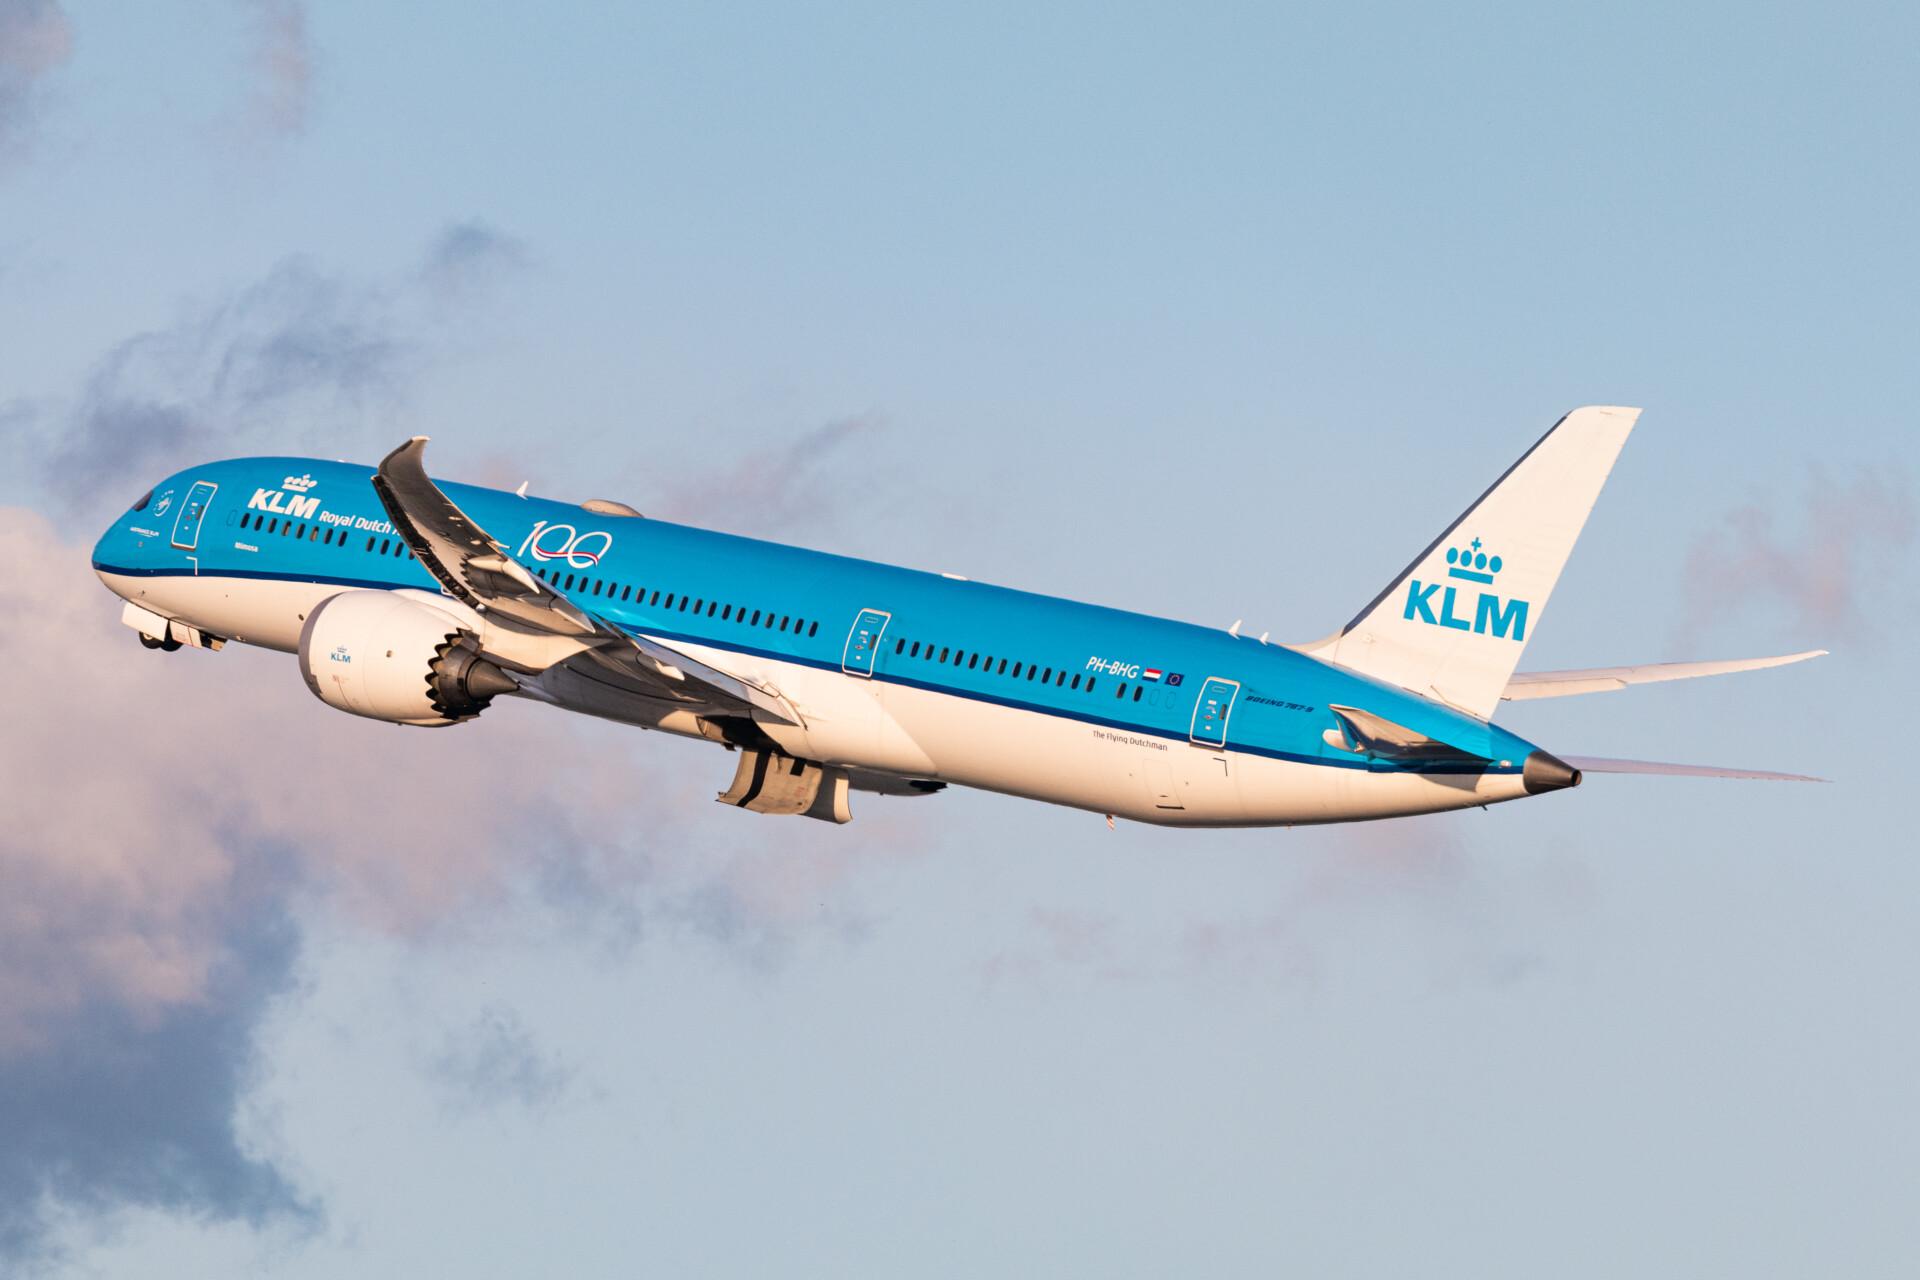 KLM Brings Back US Destinations As Travel Restrictions Ease